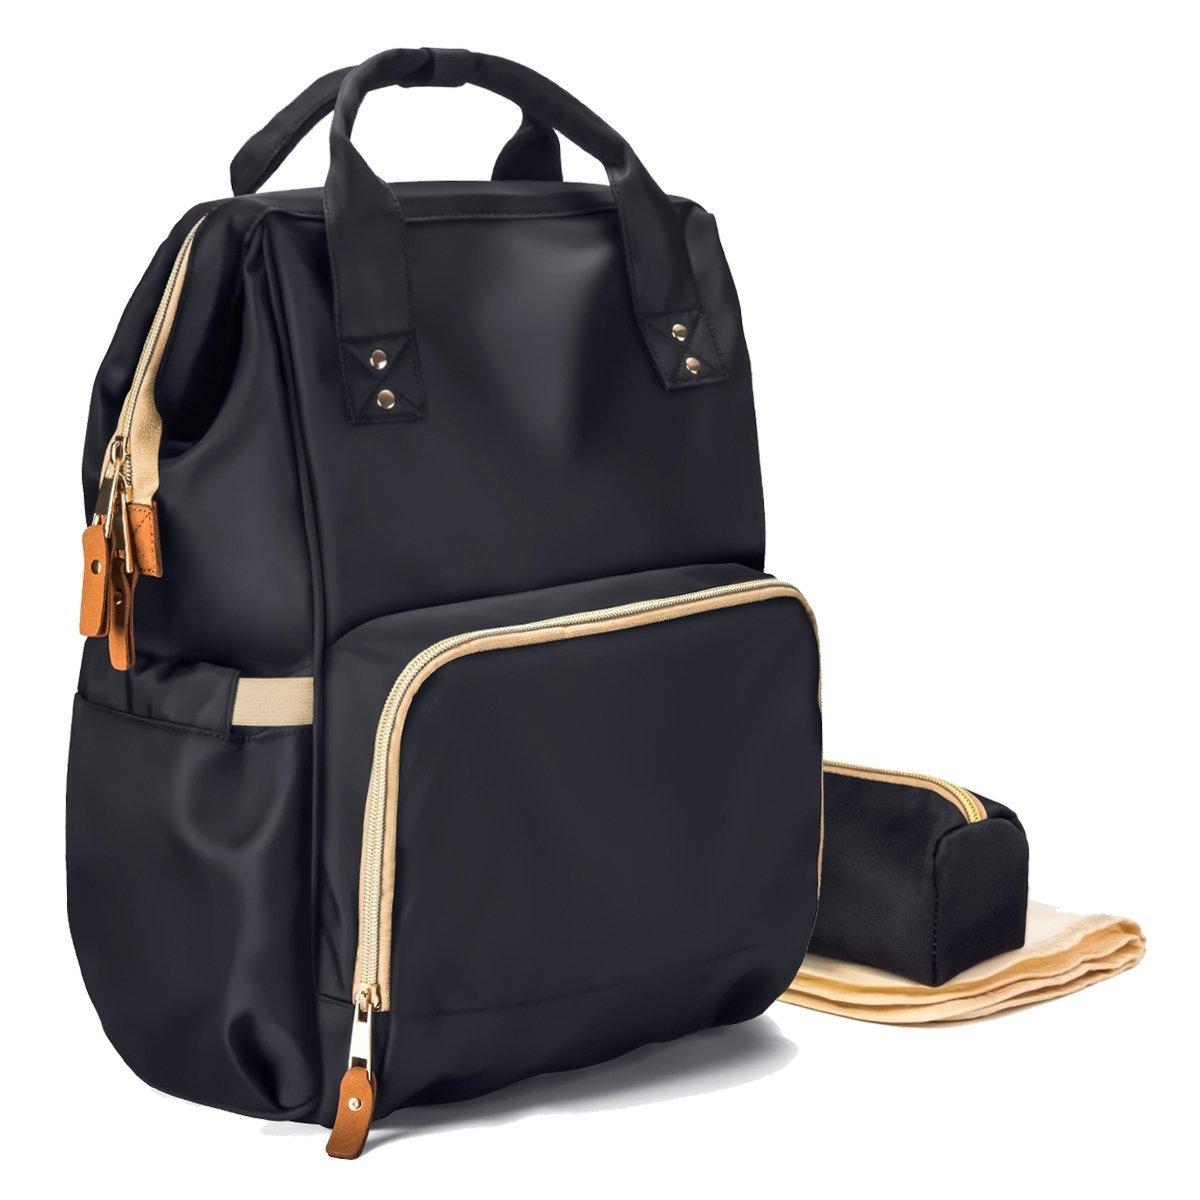 72fae638d8b LNGLAT Diaper Bag Multi-Function Waterproof Large Baby Diaper Bag Backpack  Durable Stylish Unisex...